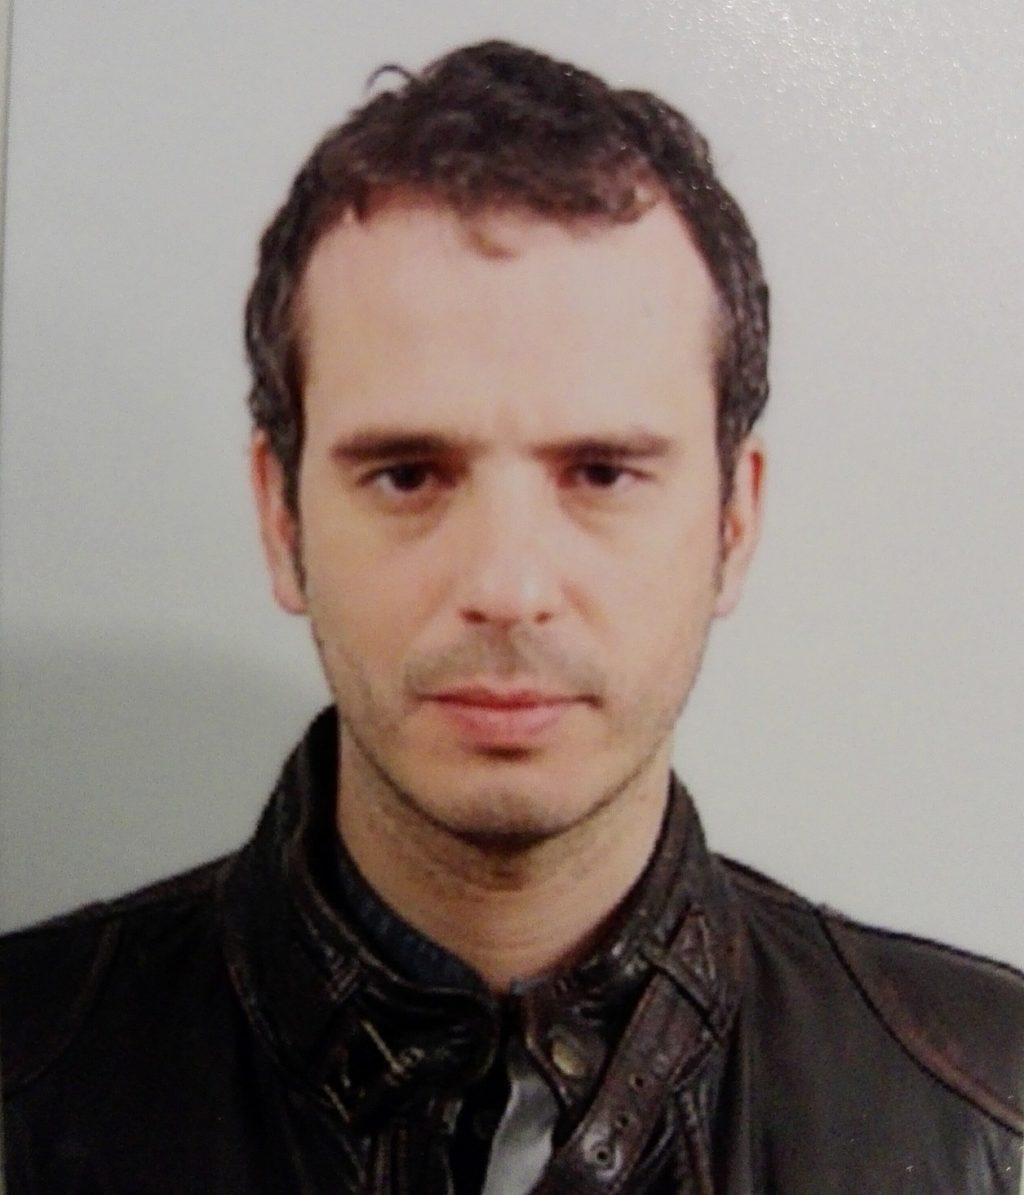 364_Luis Garces.jpg